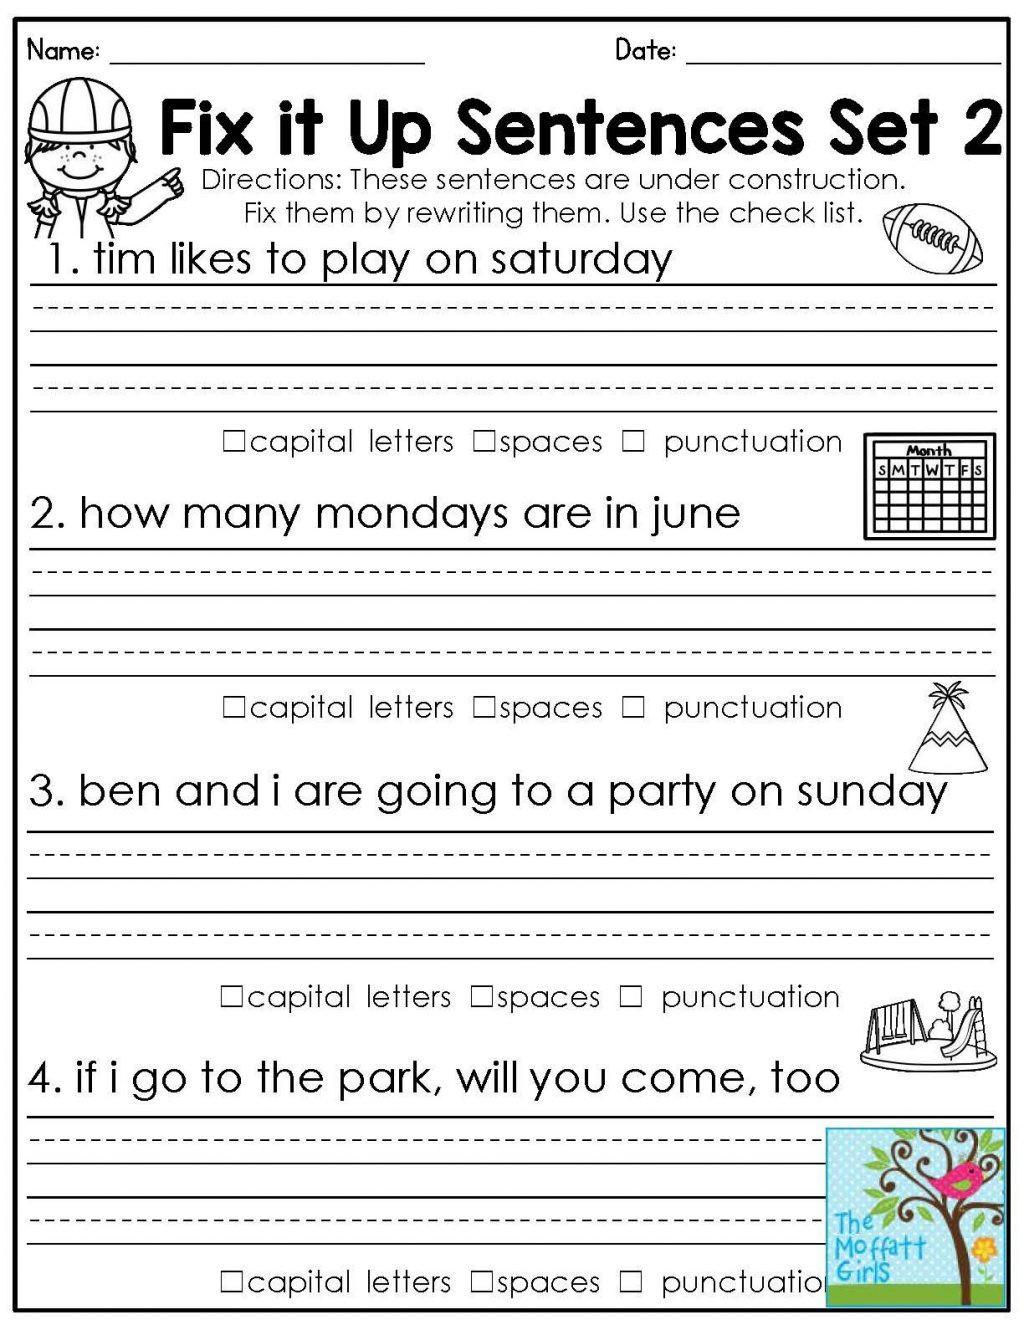 Grammar Worksheets for 2nd Grade 4 Free Grammar Worksheets Third Grade 3 Capitalization